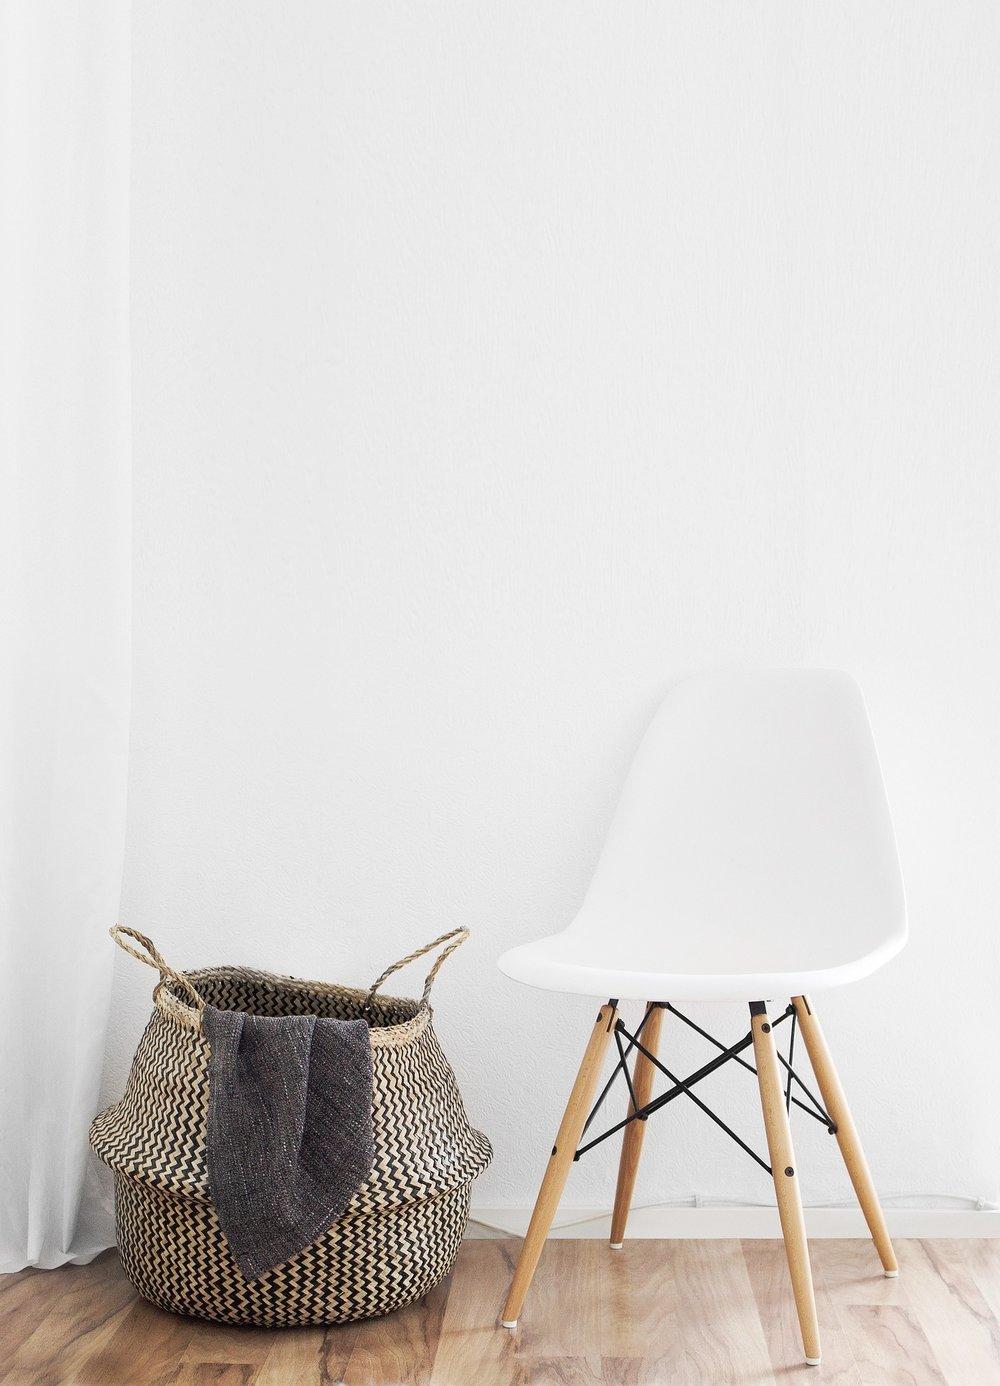 stool-732232_1280.jpg